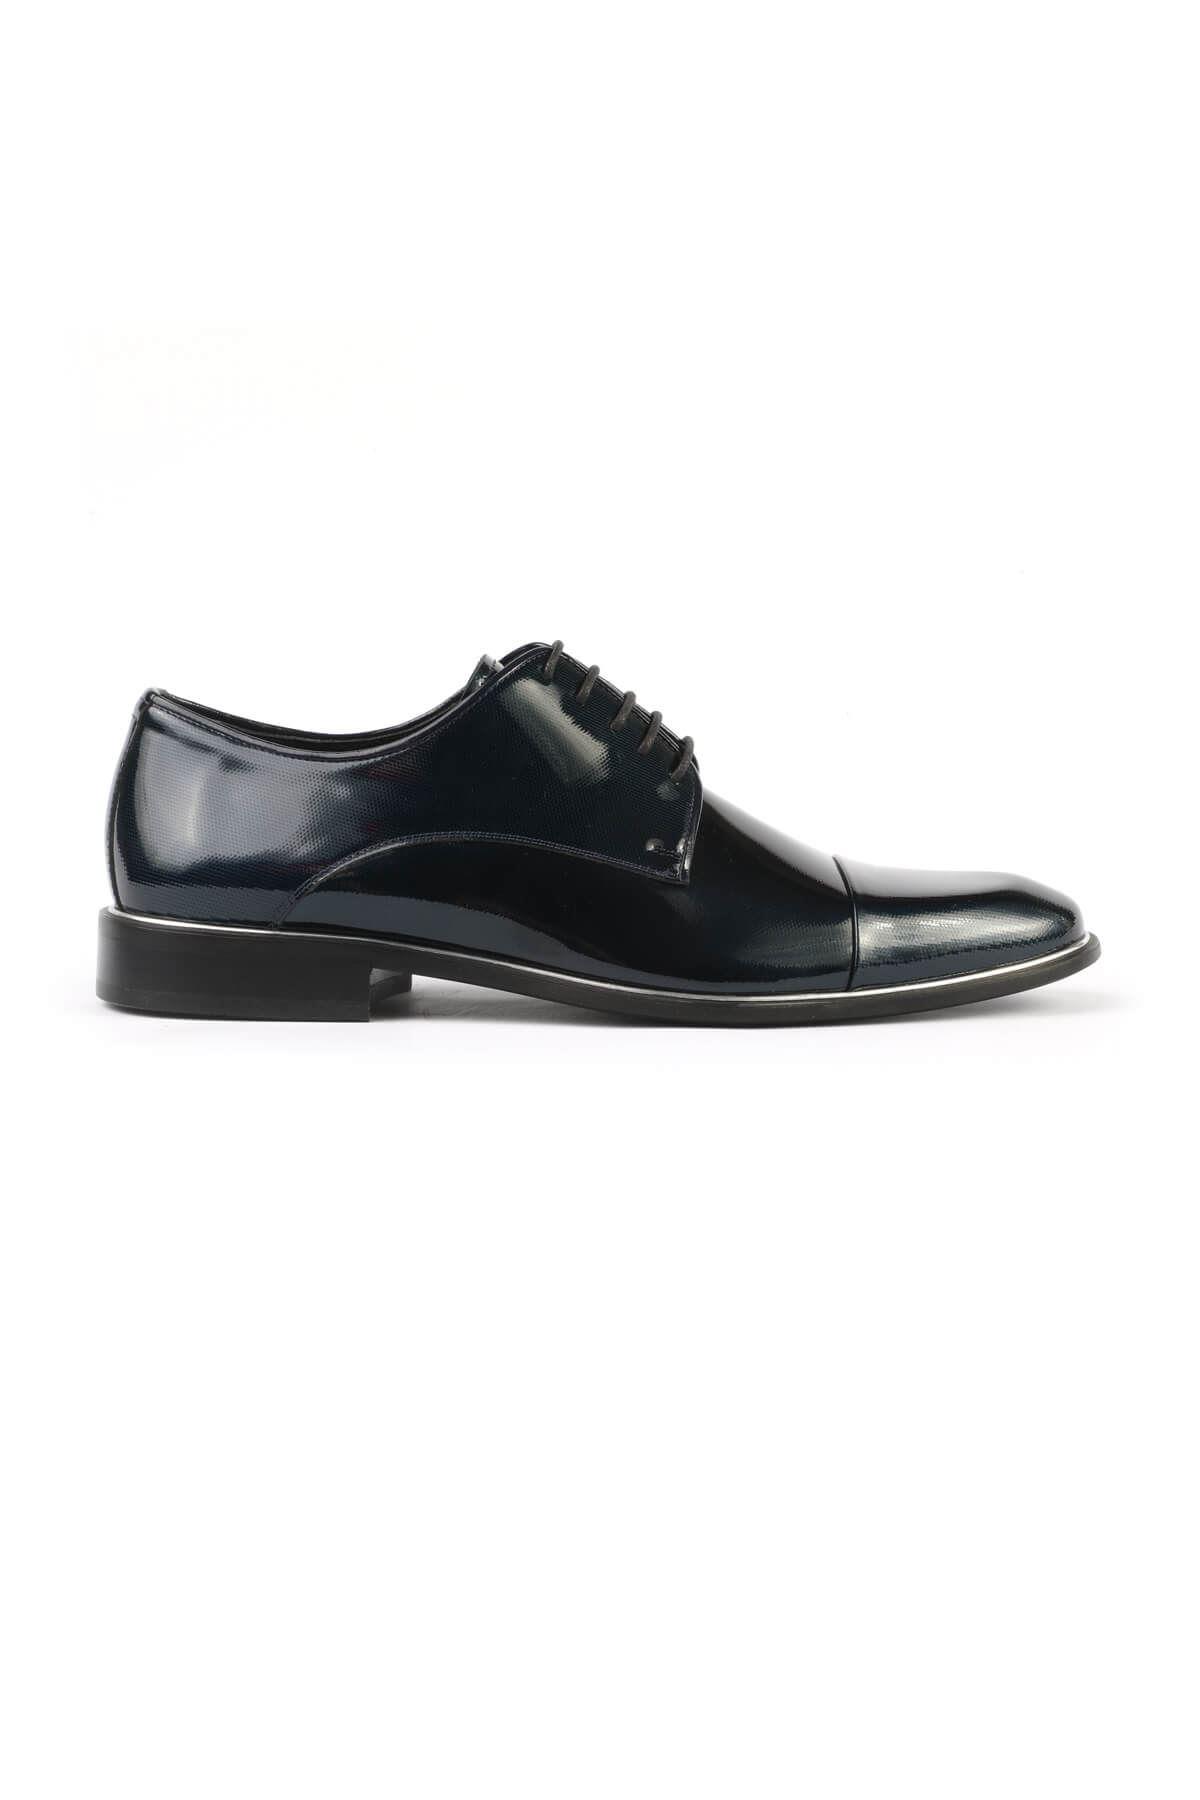 Libero 2474 Navy Blue Classic Shoes